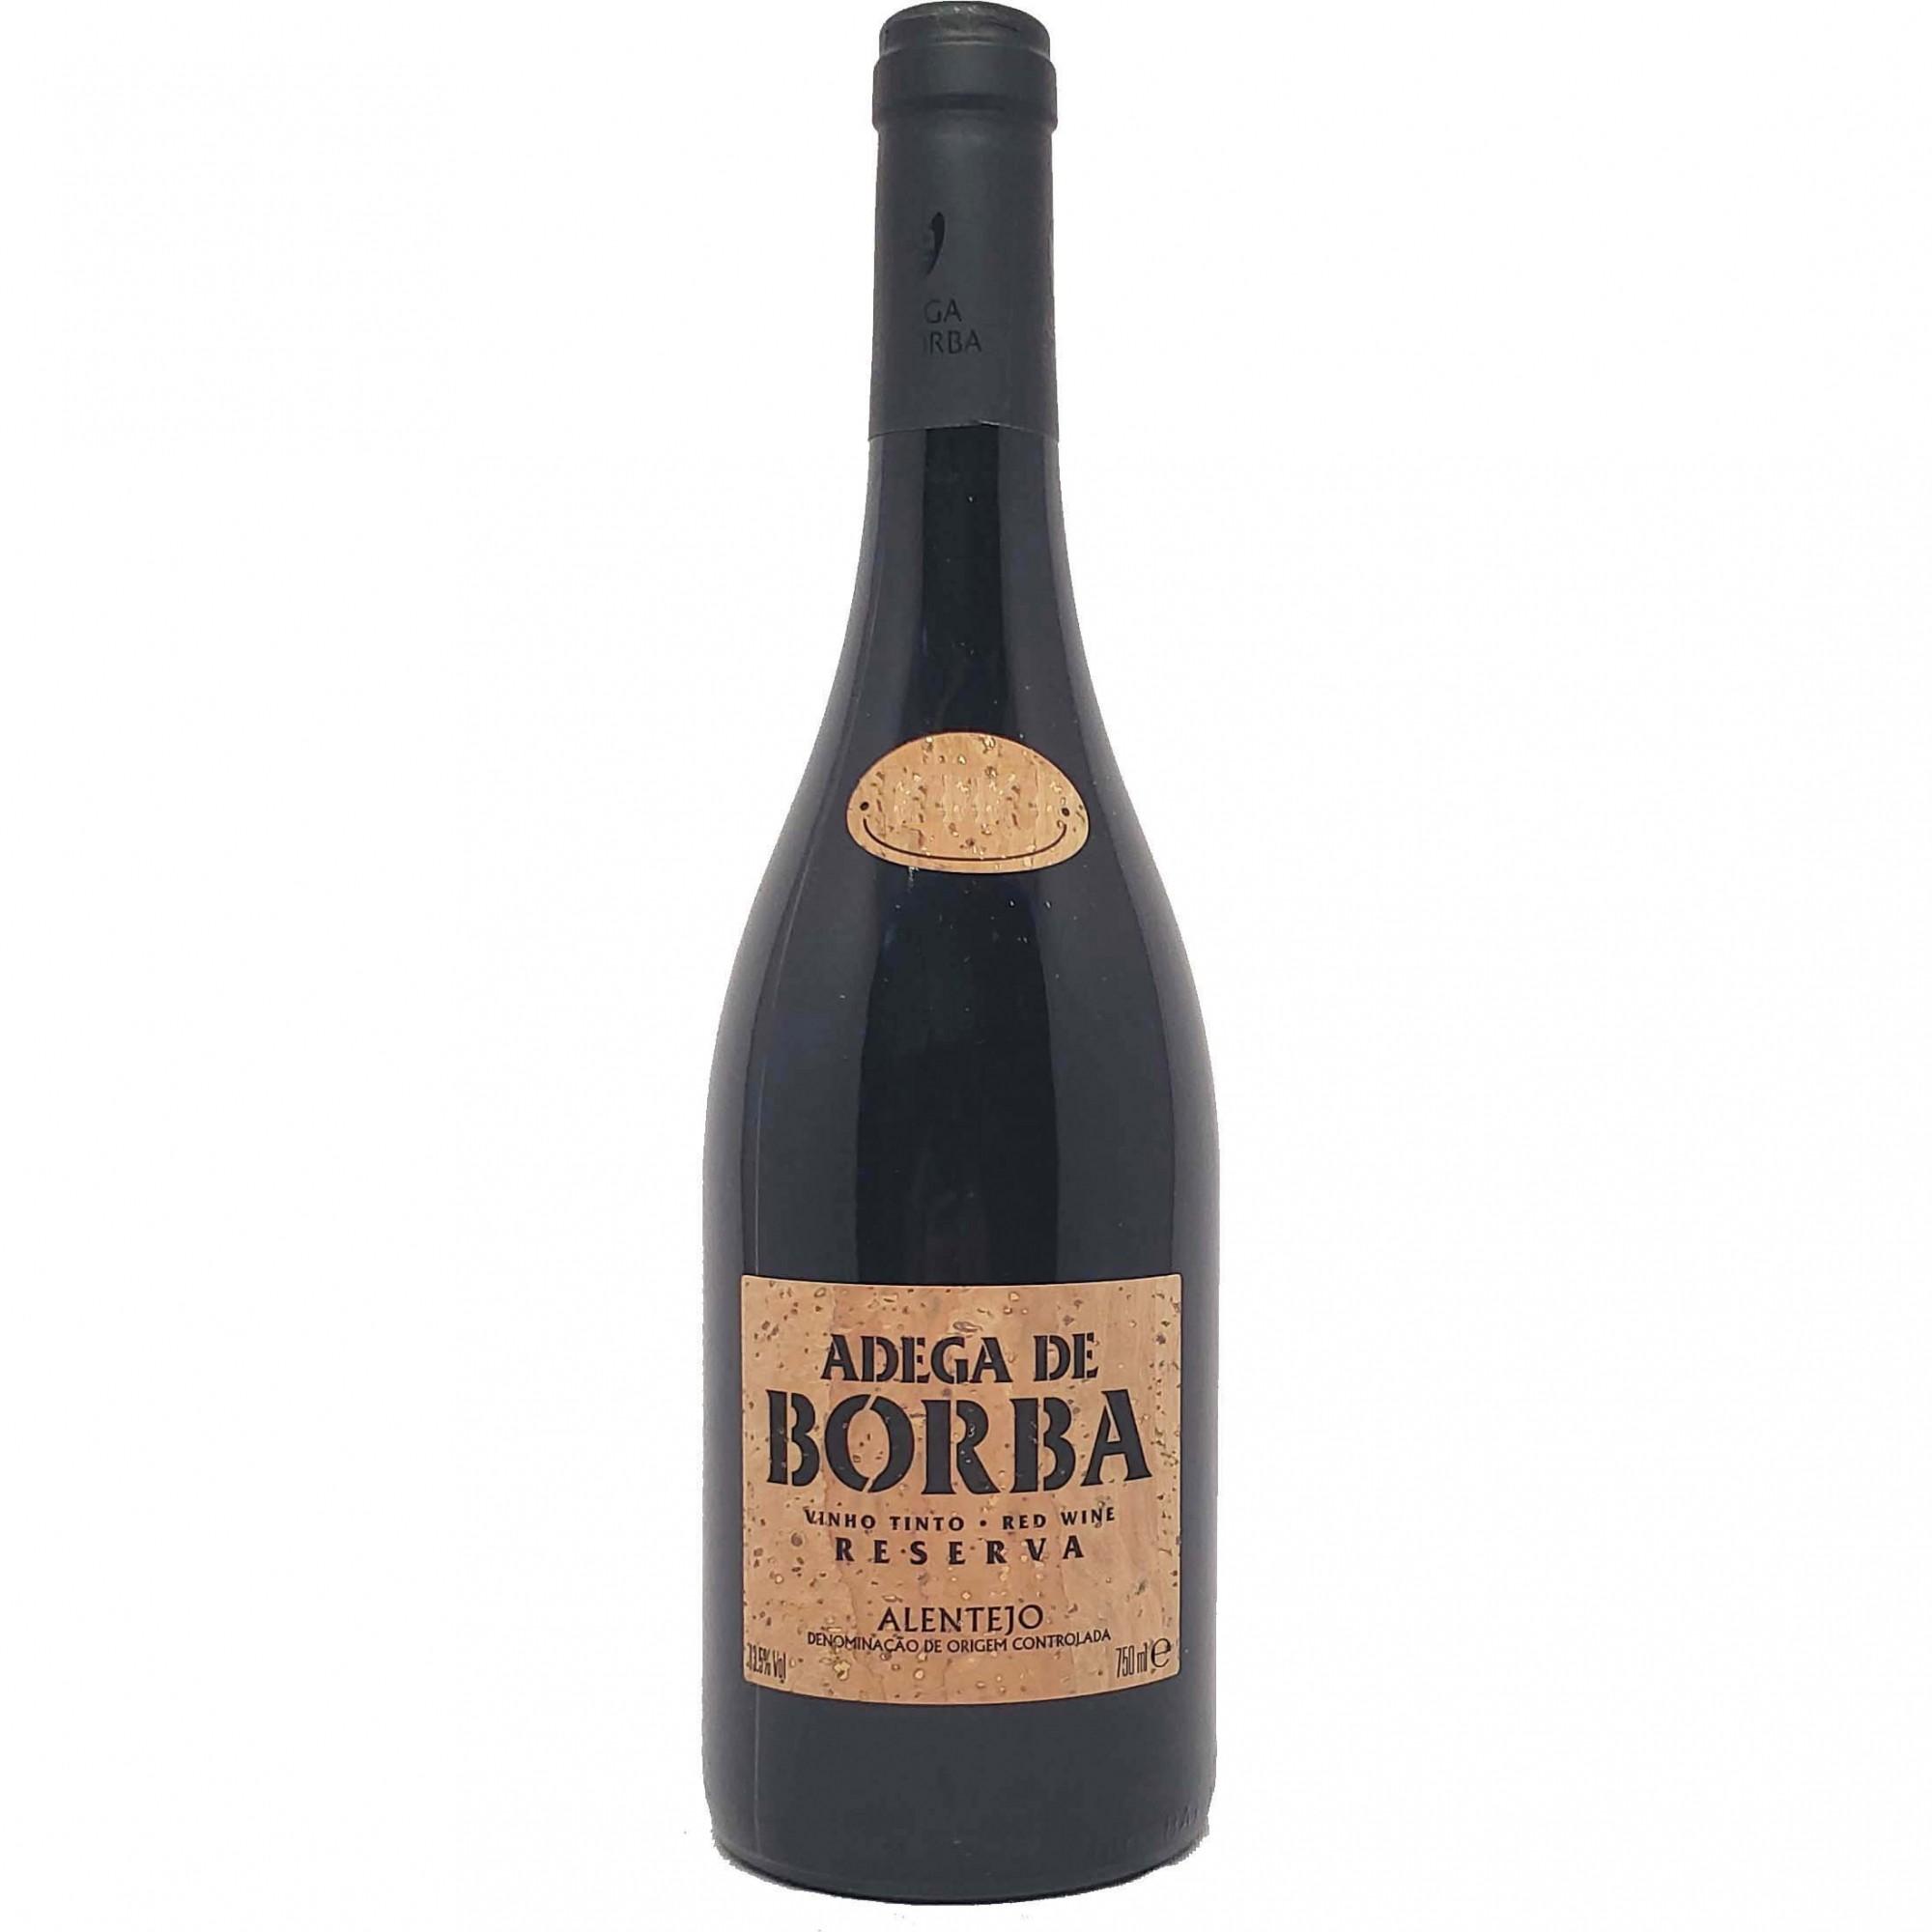 Vinho Tinto Adega de Borba Reserva D.O.C - 750ml -